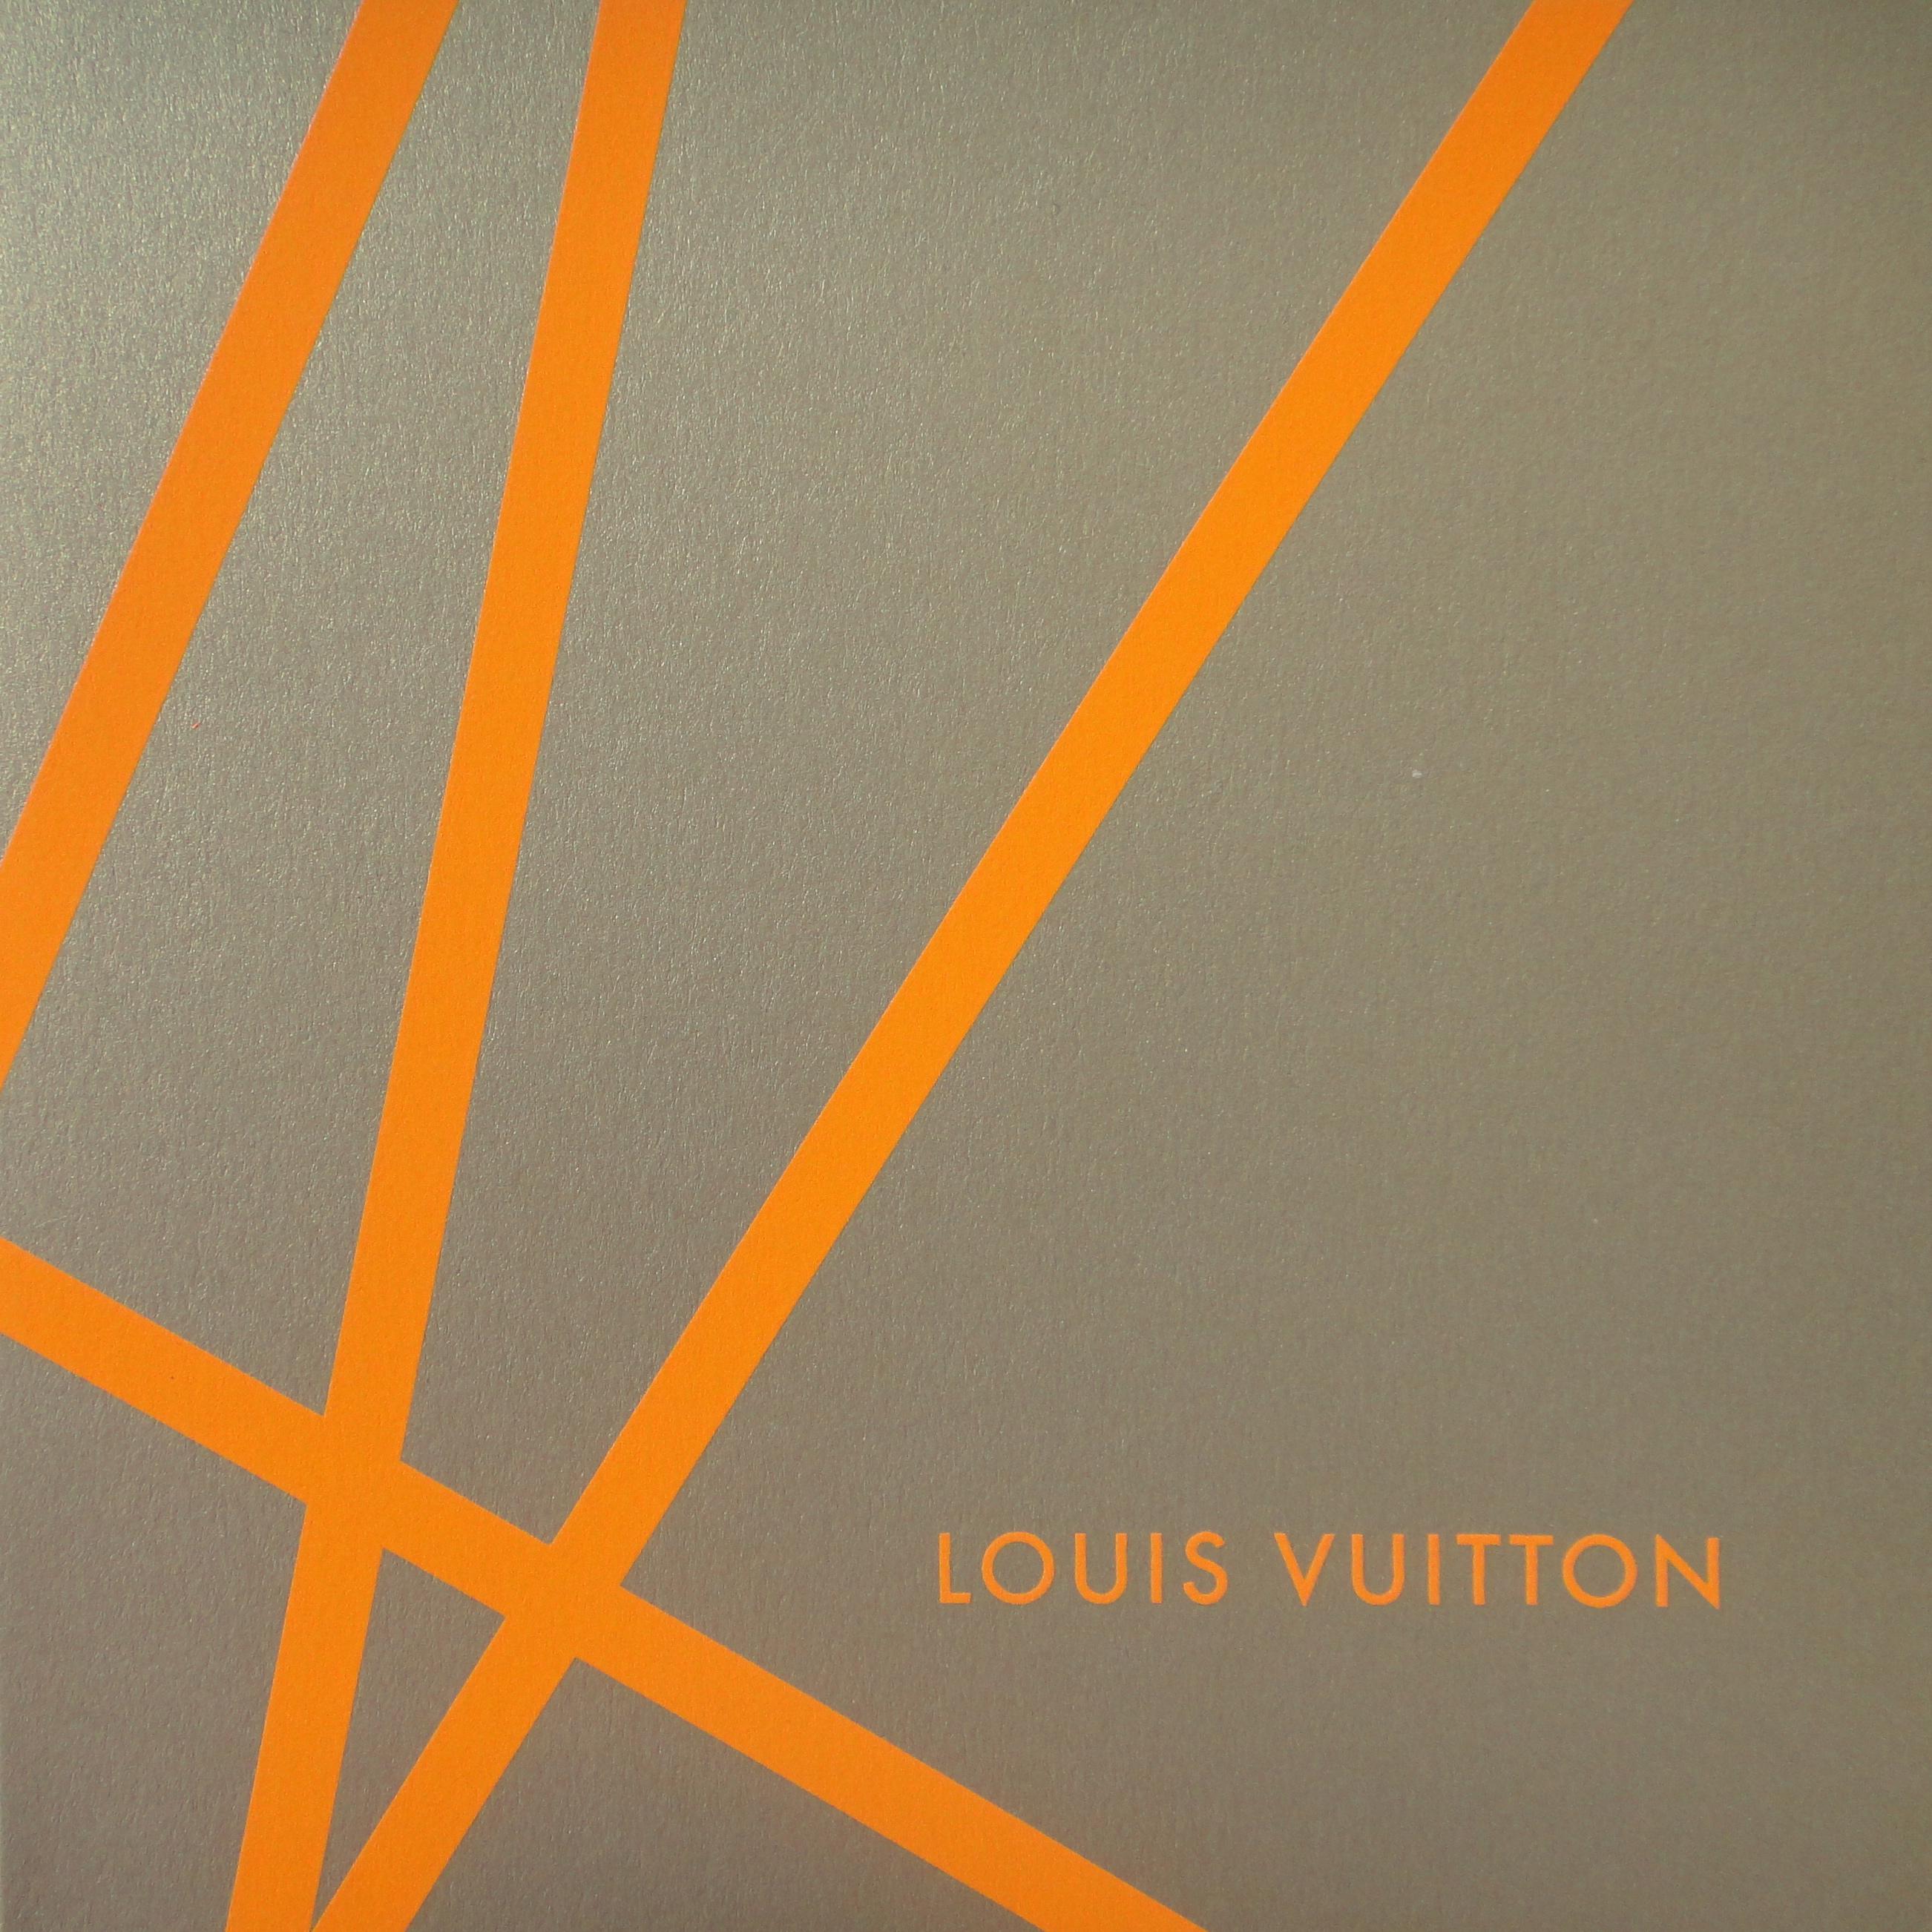 Christmas card 2002 - Louis Vuitton - Weihnachtskarte 2002